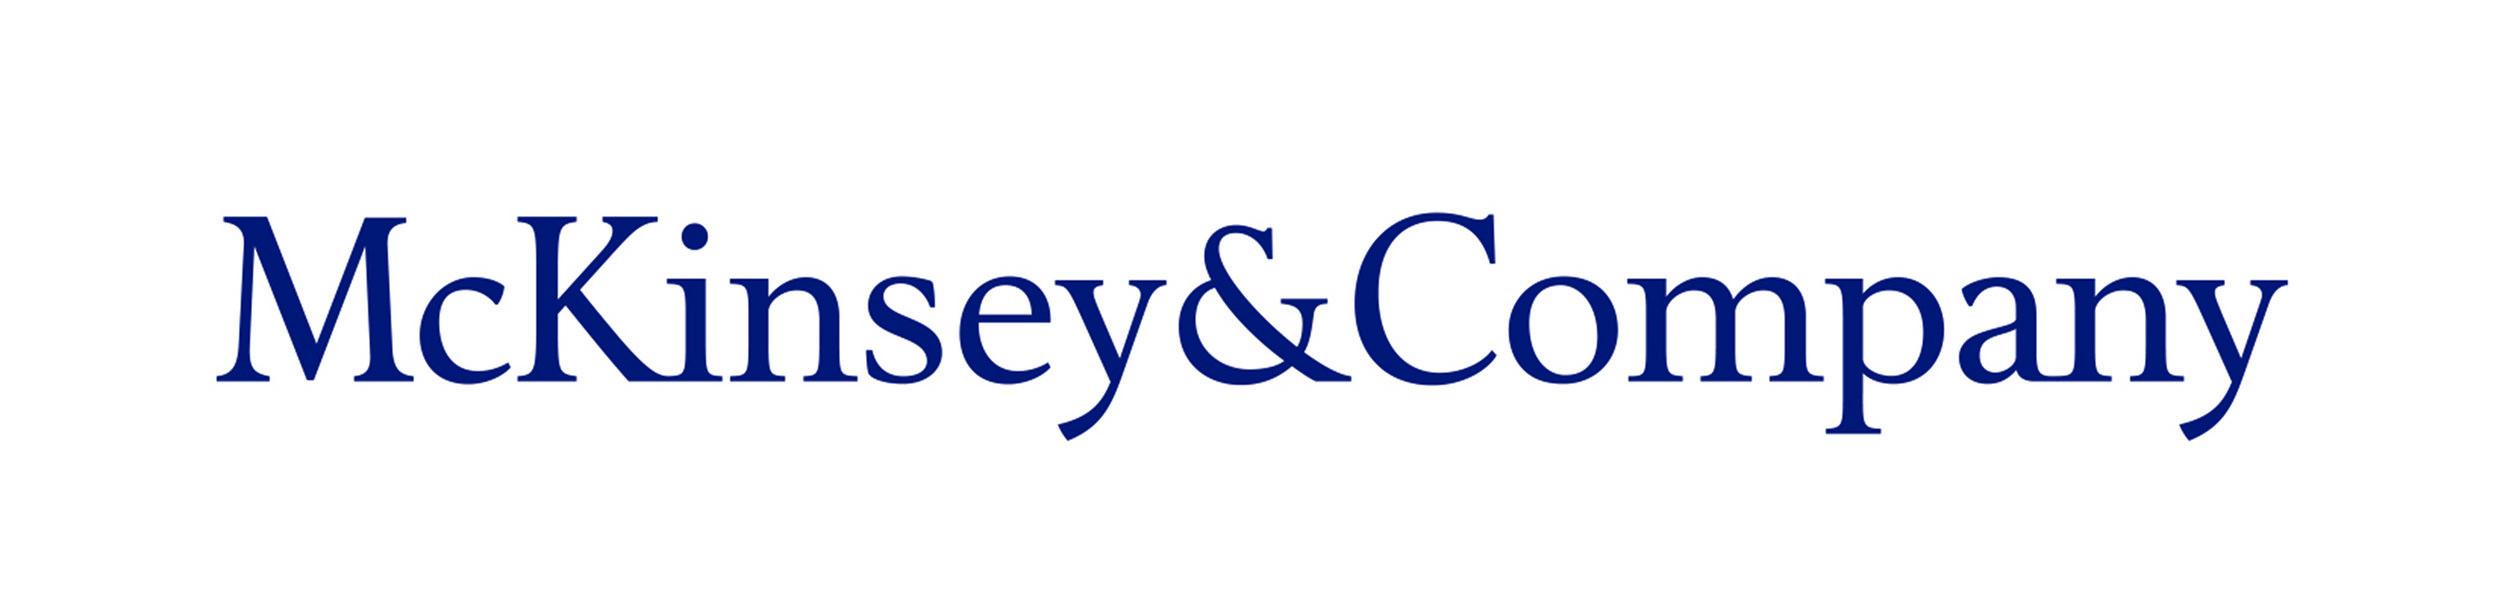 mckinsey-logo-official.jpg